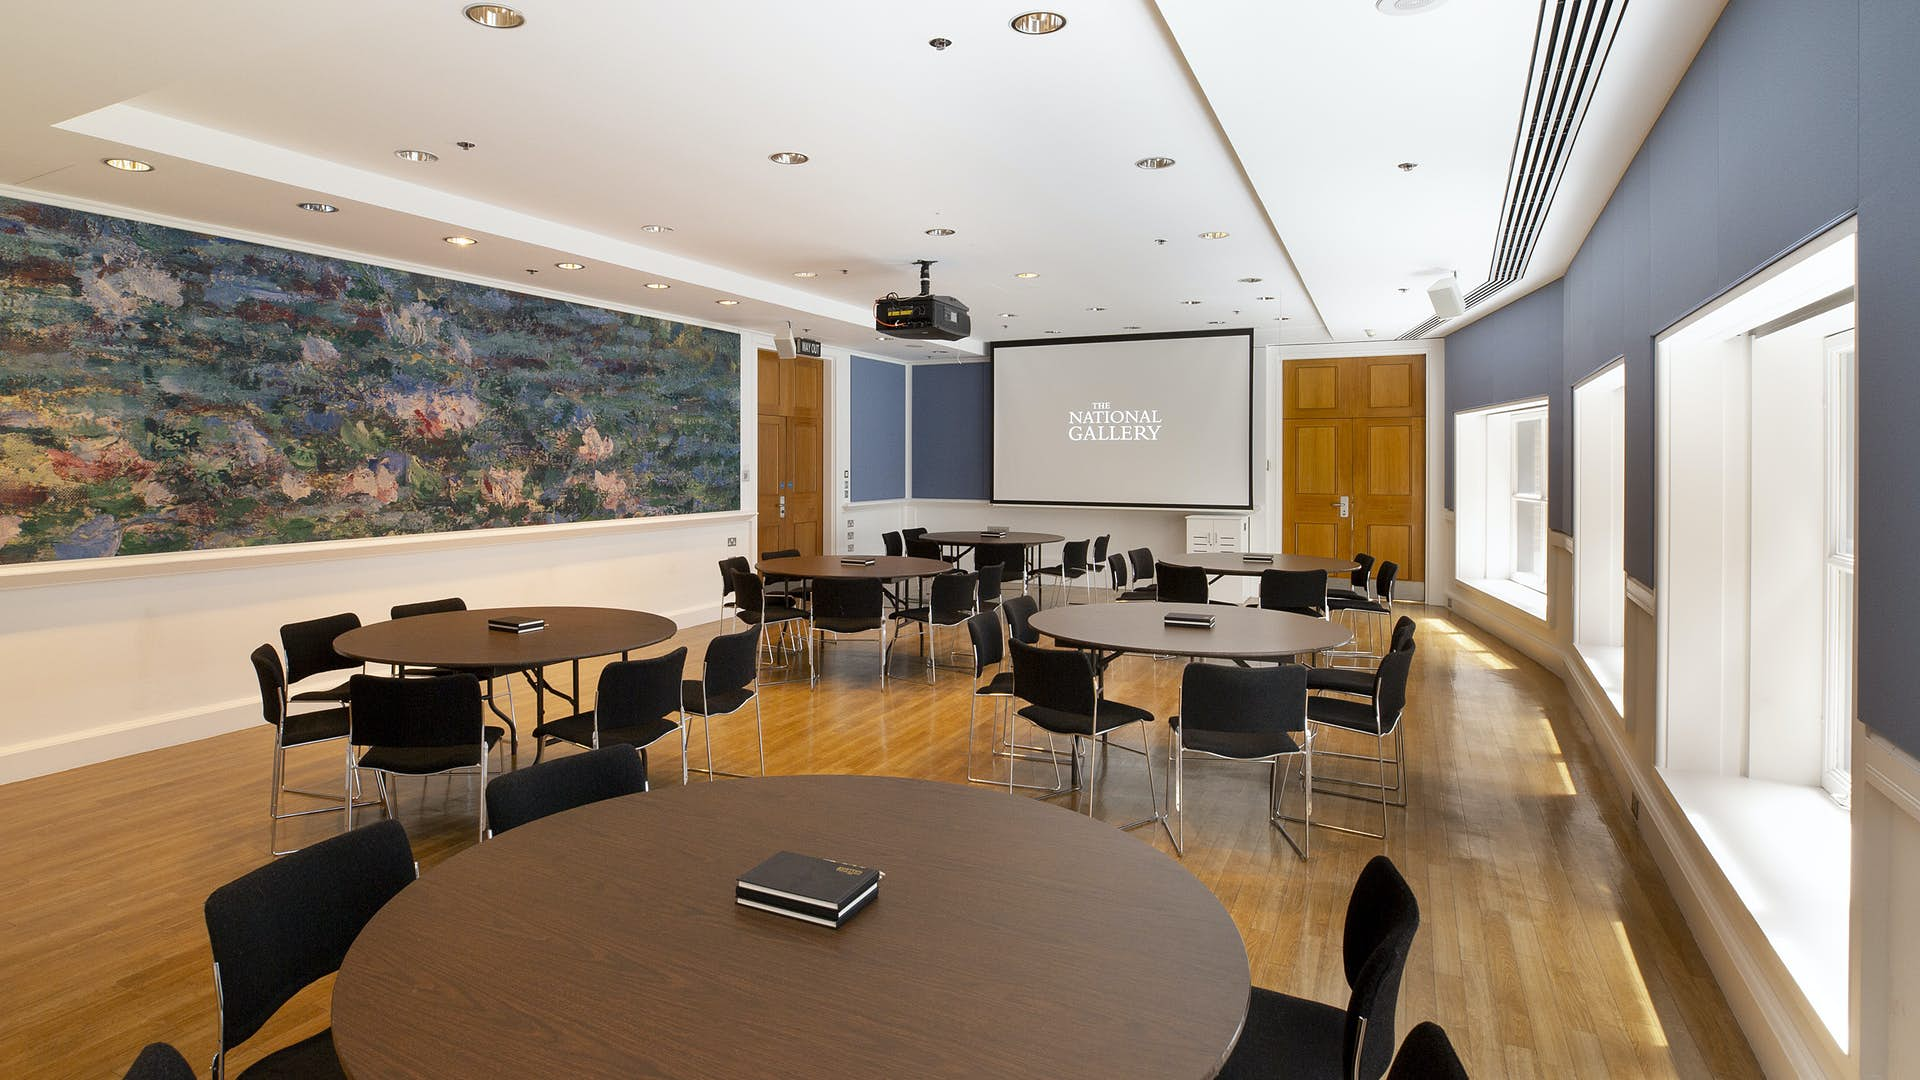 The Monet Meeting Room